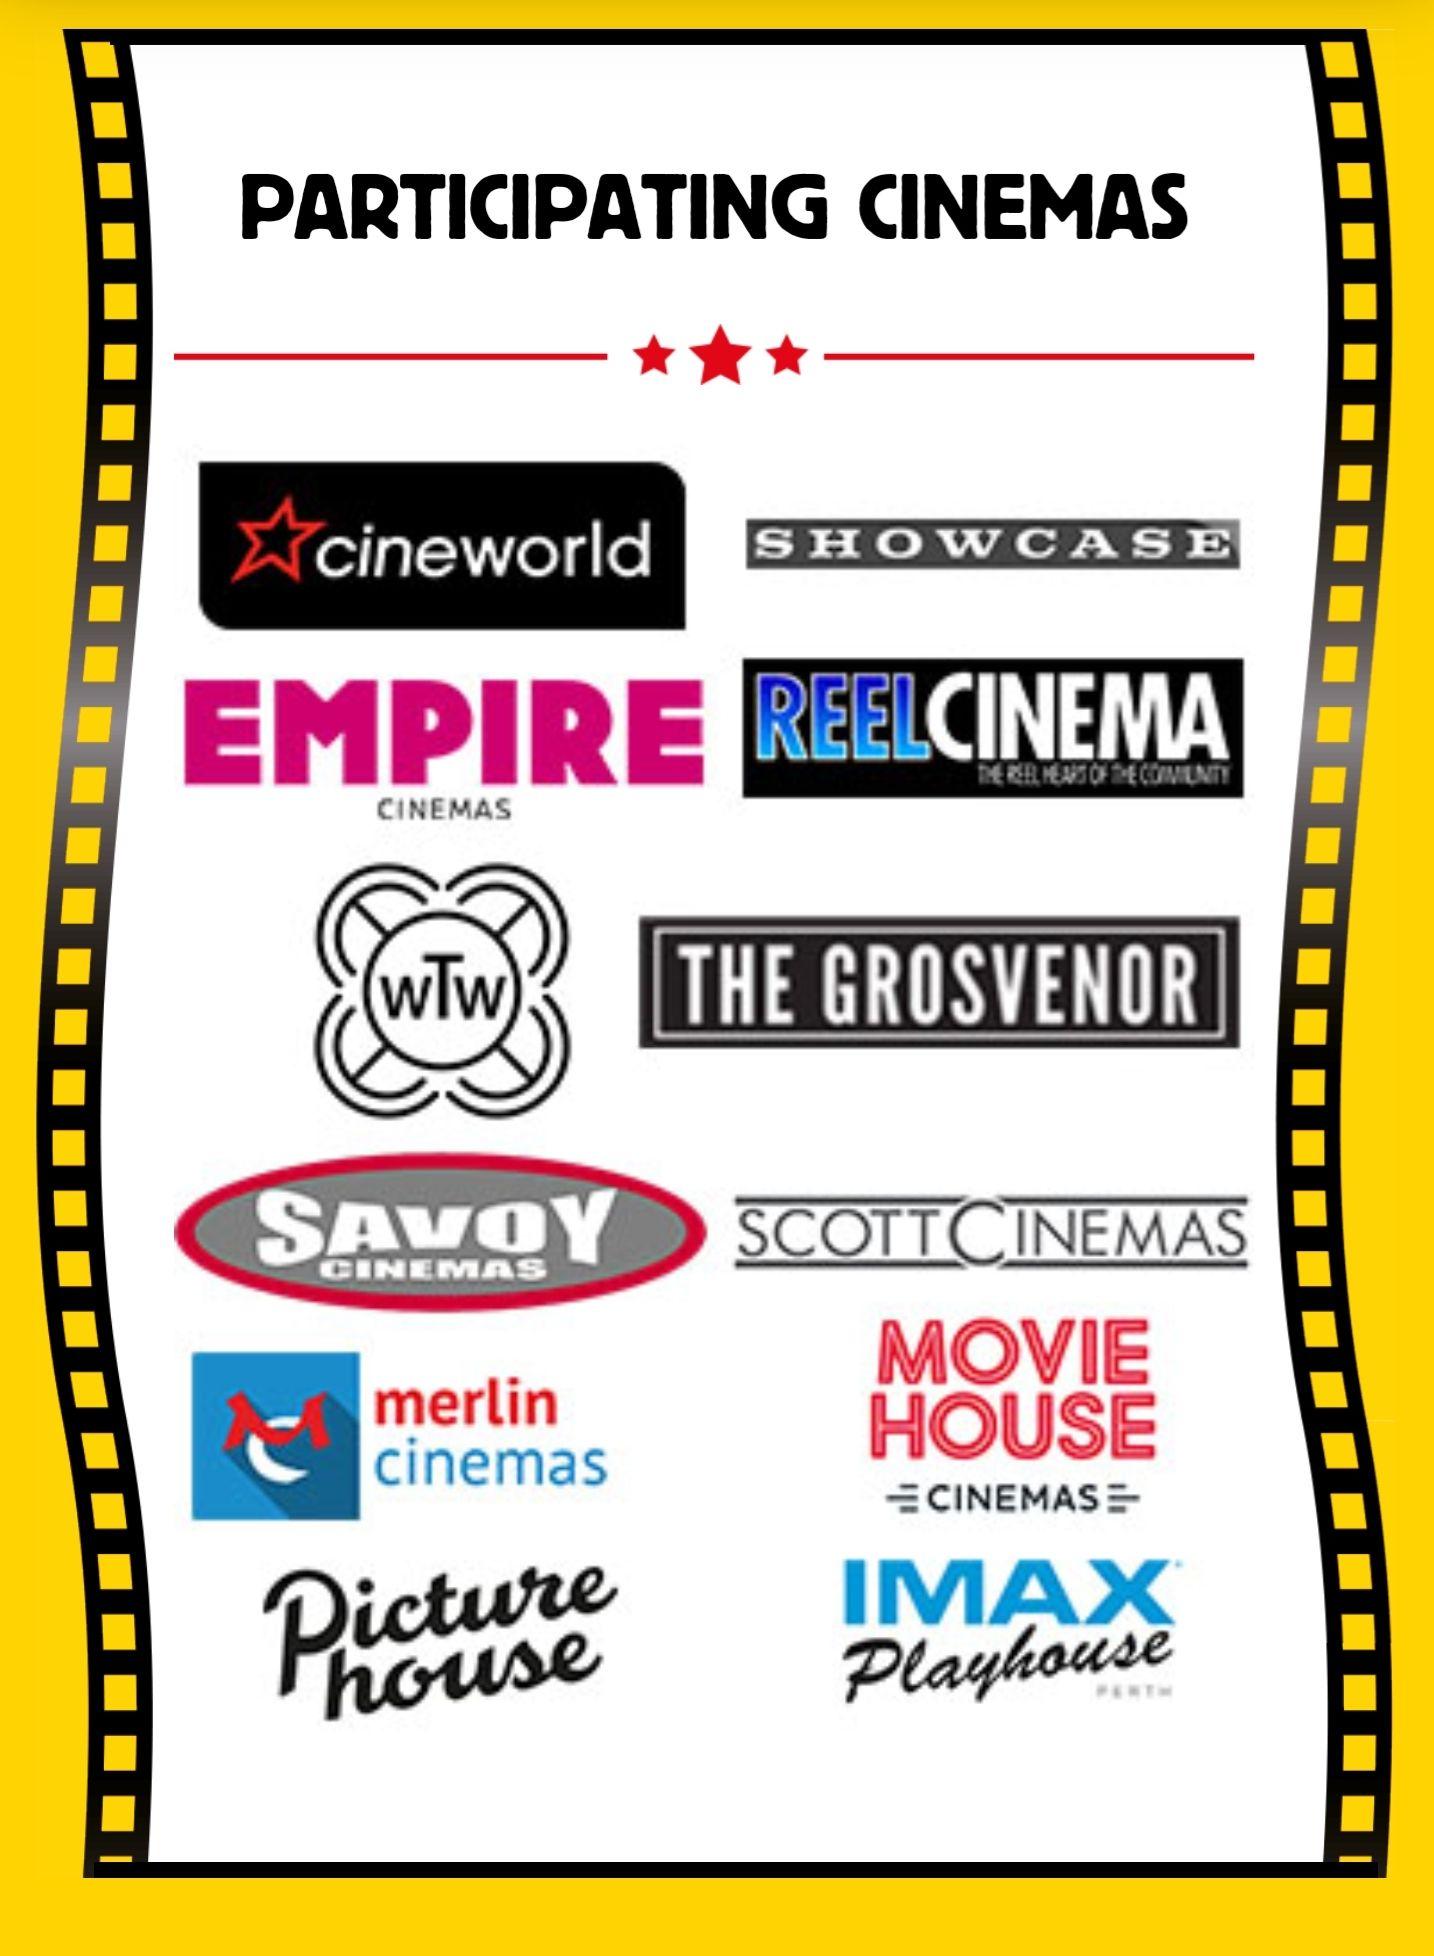 Sunday cinema tickets, Sweet Sunday's is back at Tesco from £2.48 (Starburst / Skittles)